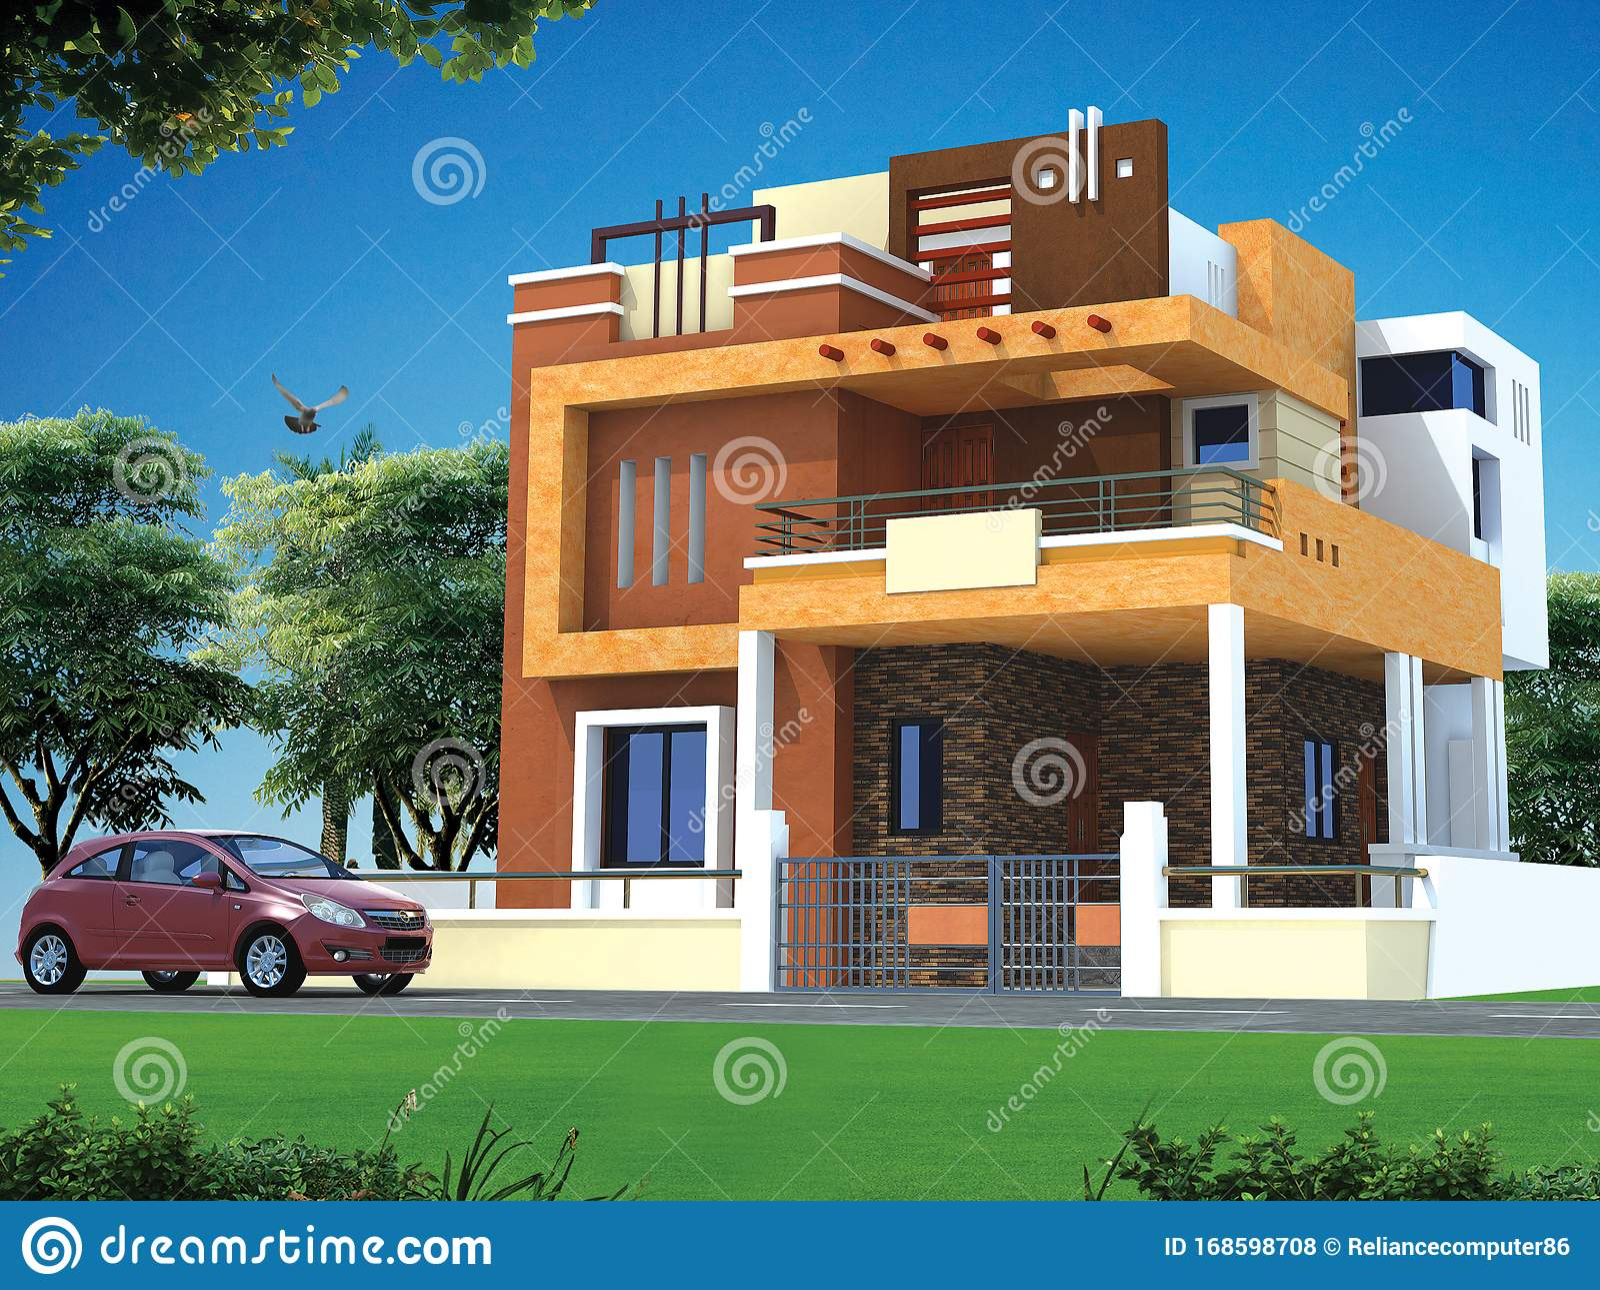 Best House Design Images   Best House Images   Neueste Hausbilder ...